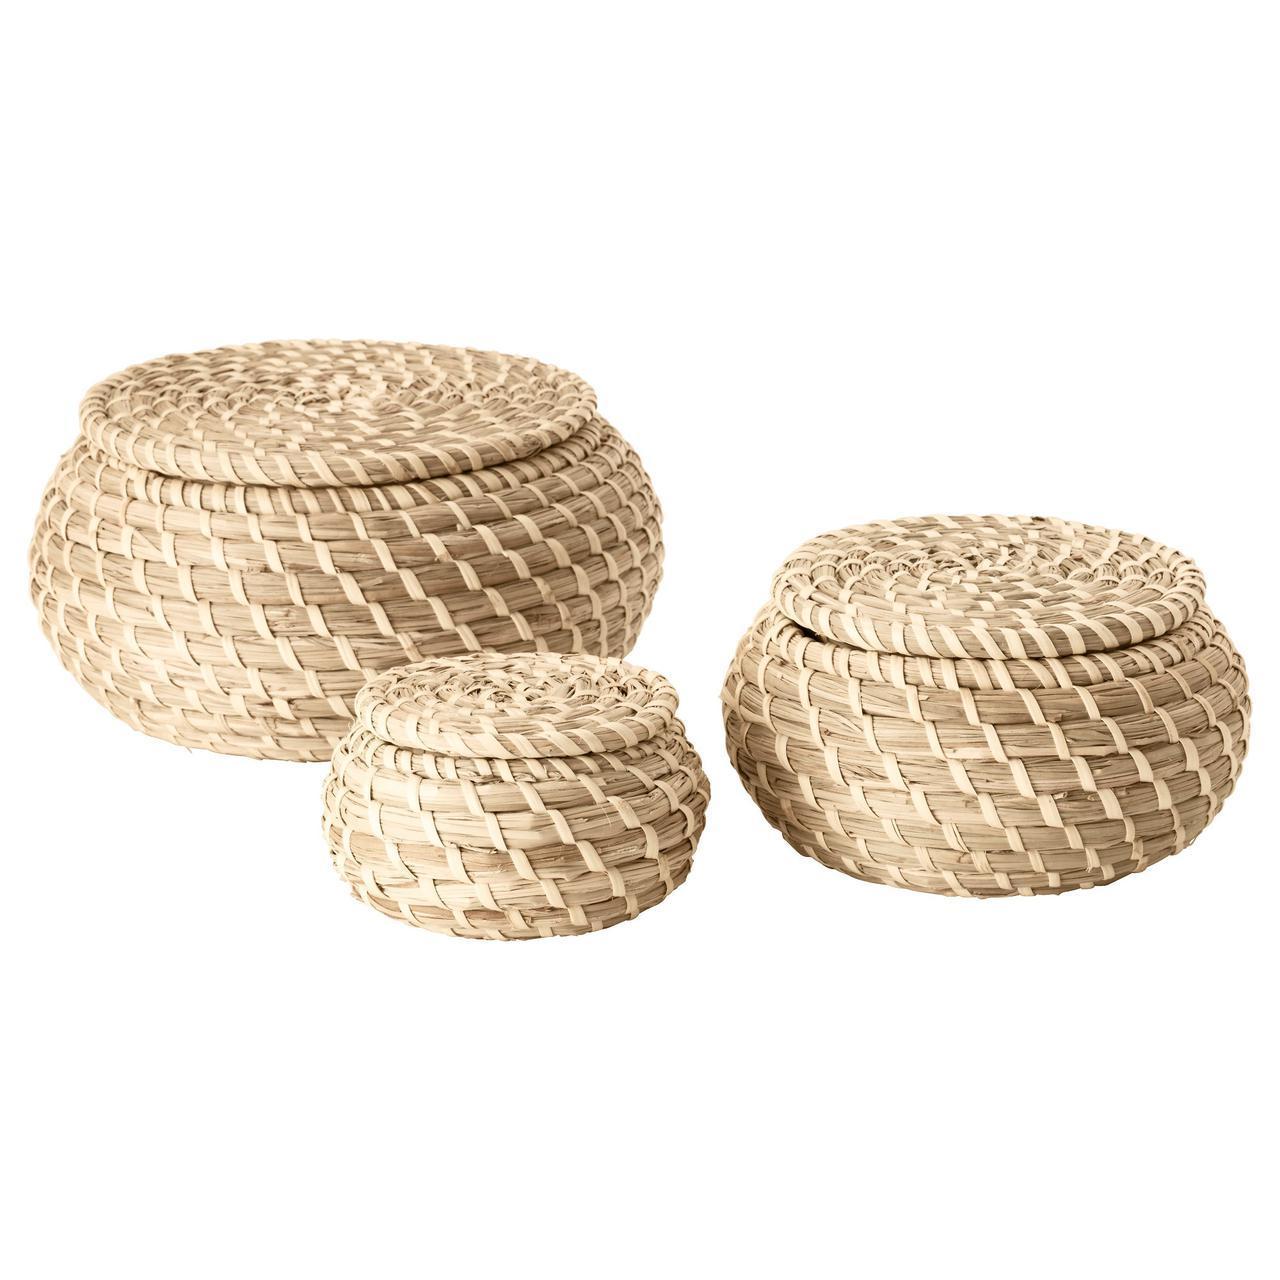 ✅ IKEA FRYKEN (803.281.45) Коробка с крышкой, 3 шт., Трава морской травы